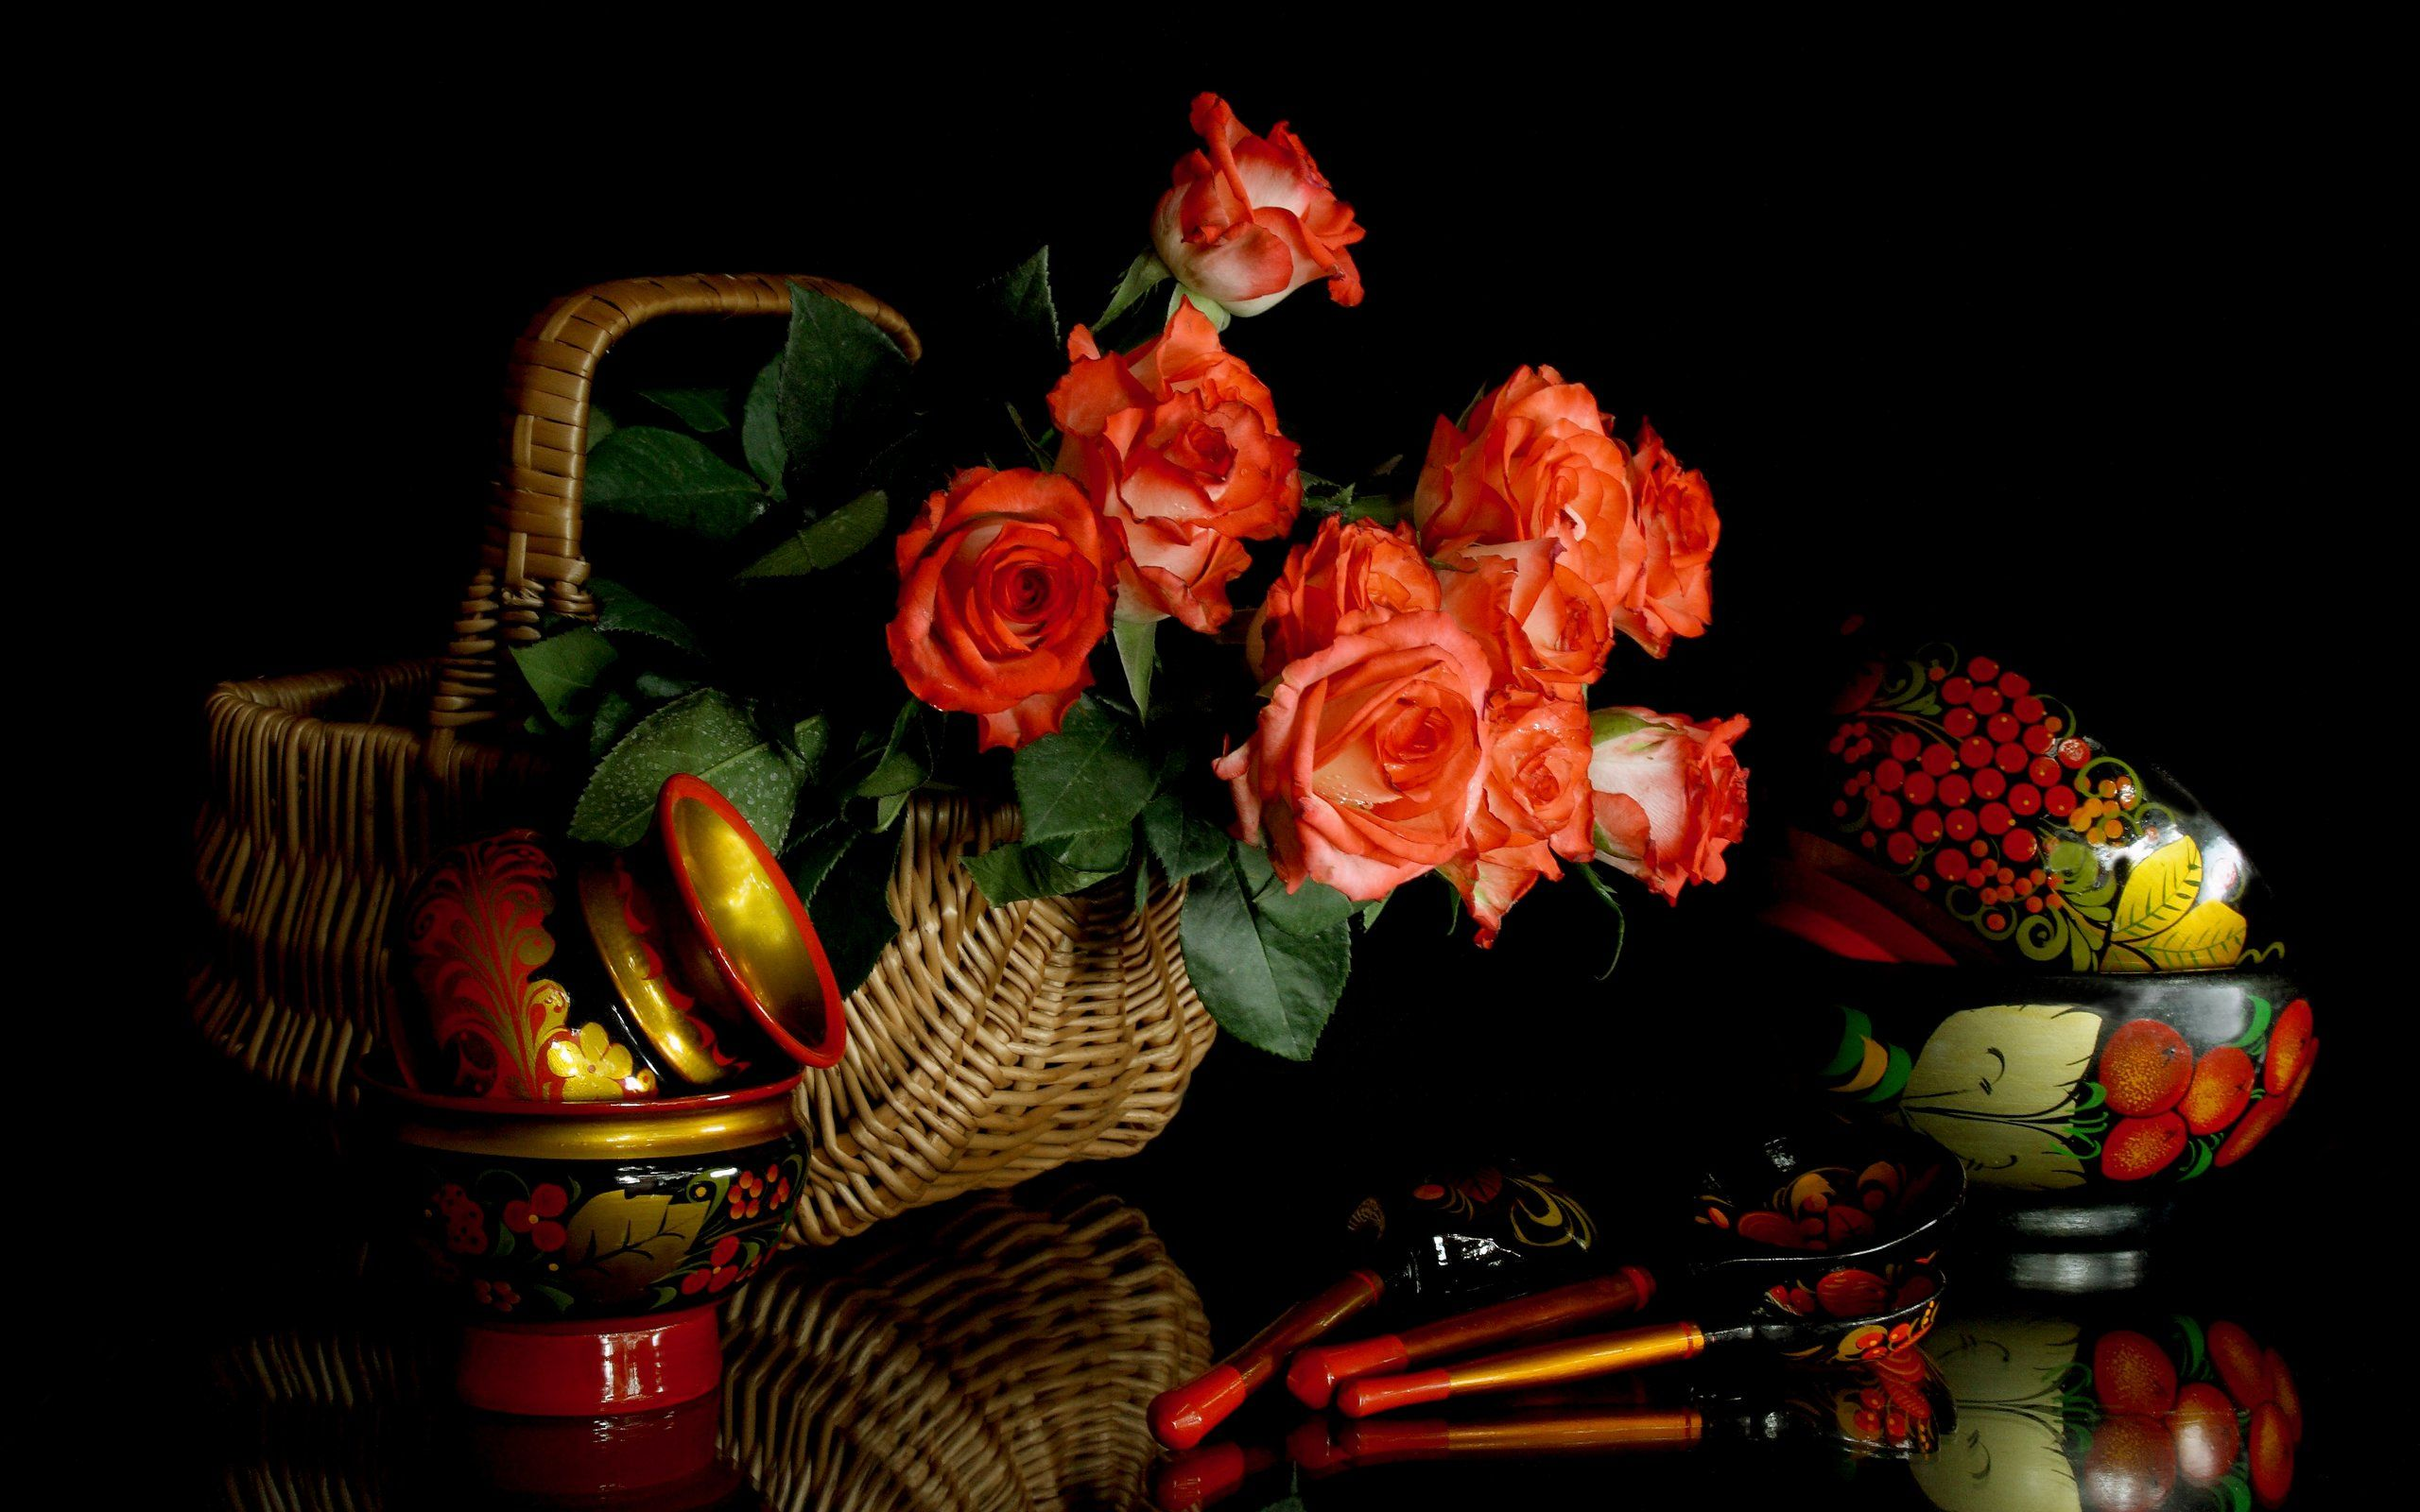 Hd Beautiful Roses Wallpaper Rose Wallpaper Beautiful Roses